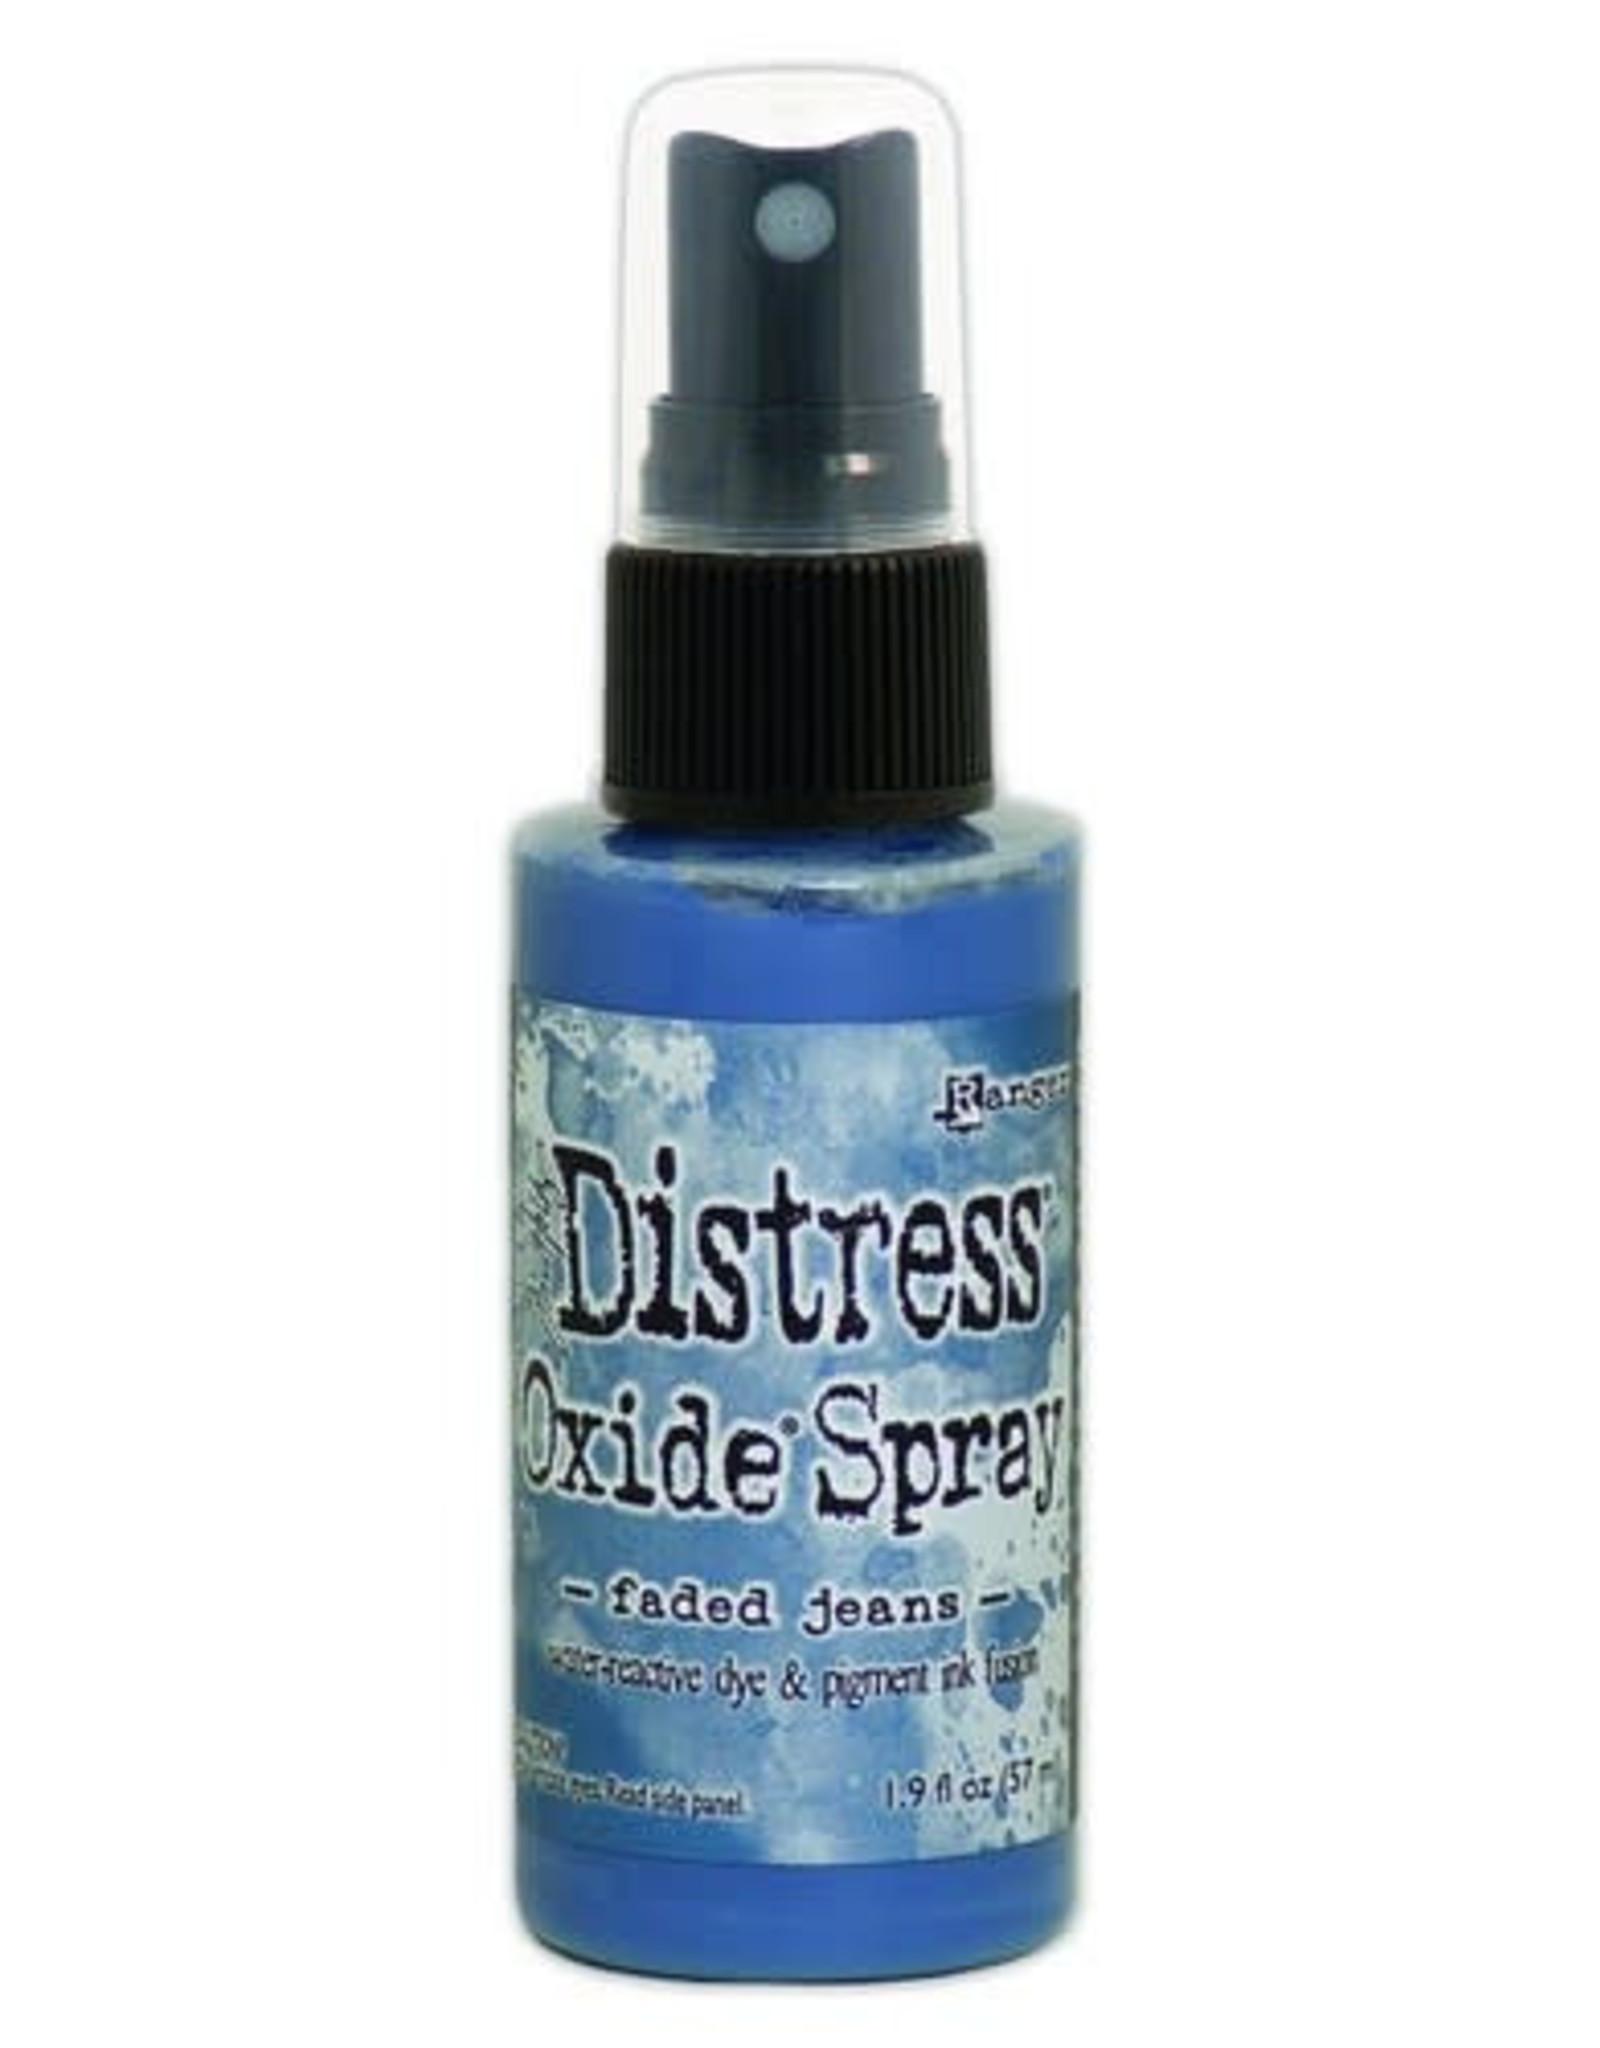 Ranger Ranger Distress Oxide Spray - Faded Jeans TSO64732 Tim Holtz